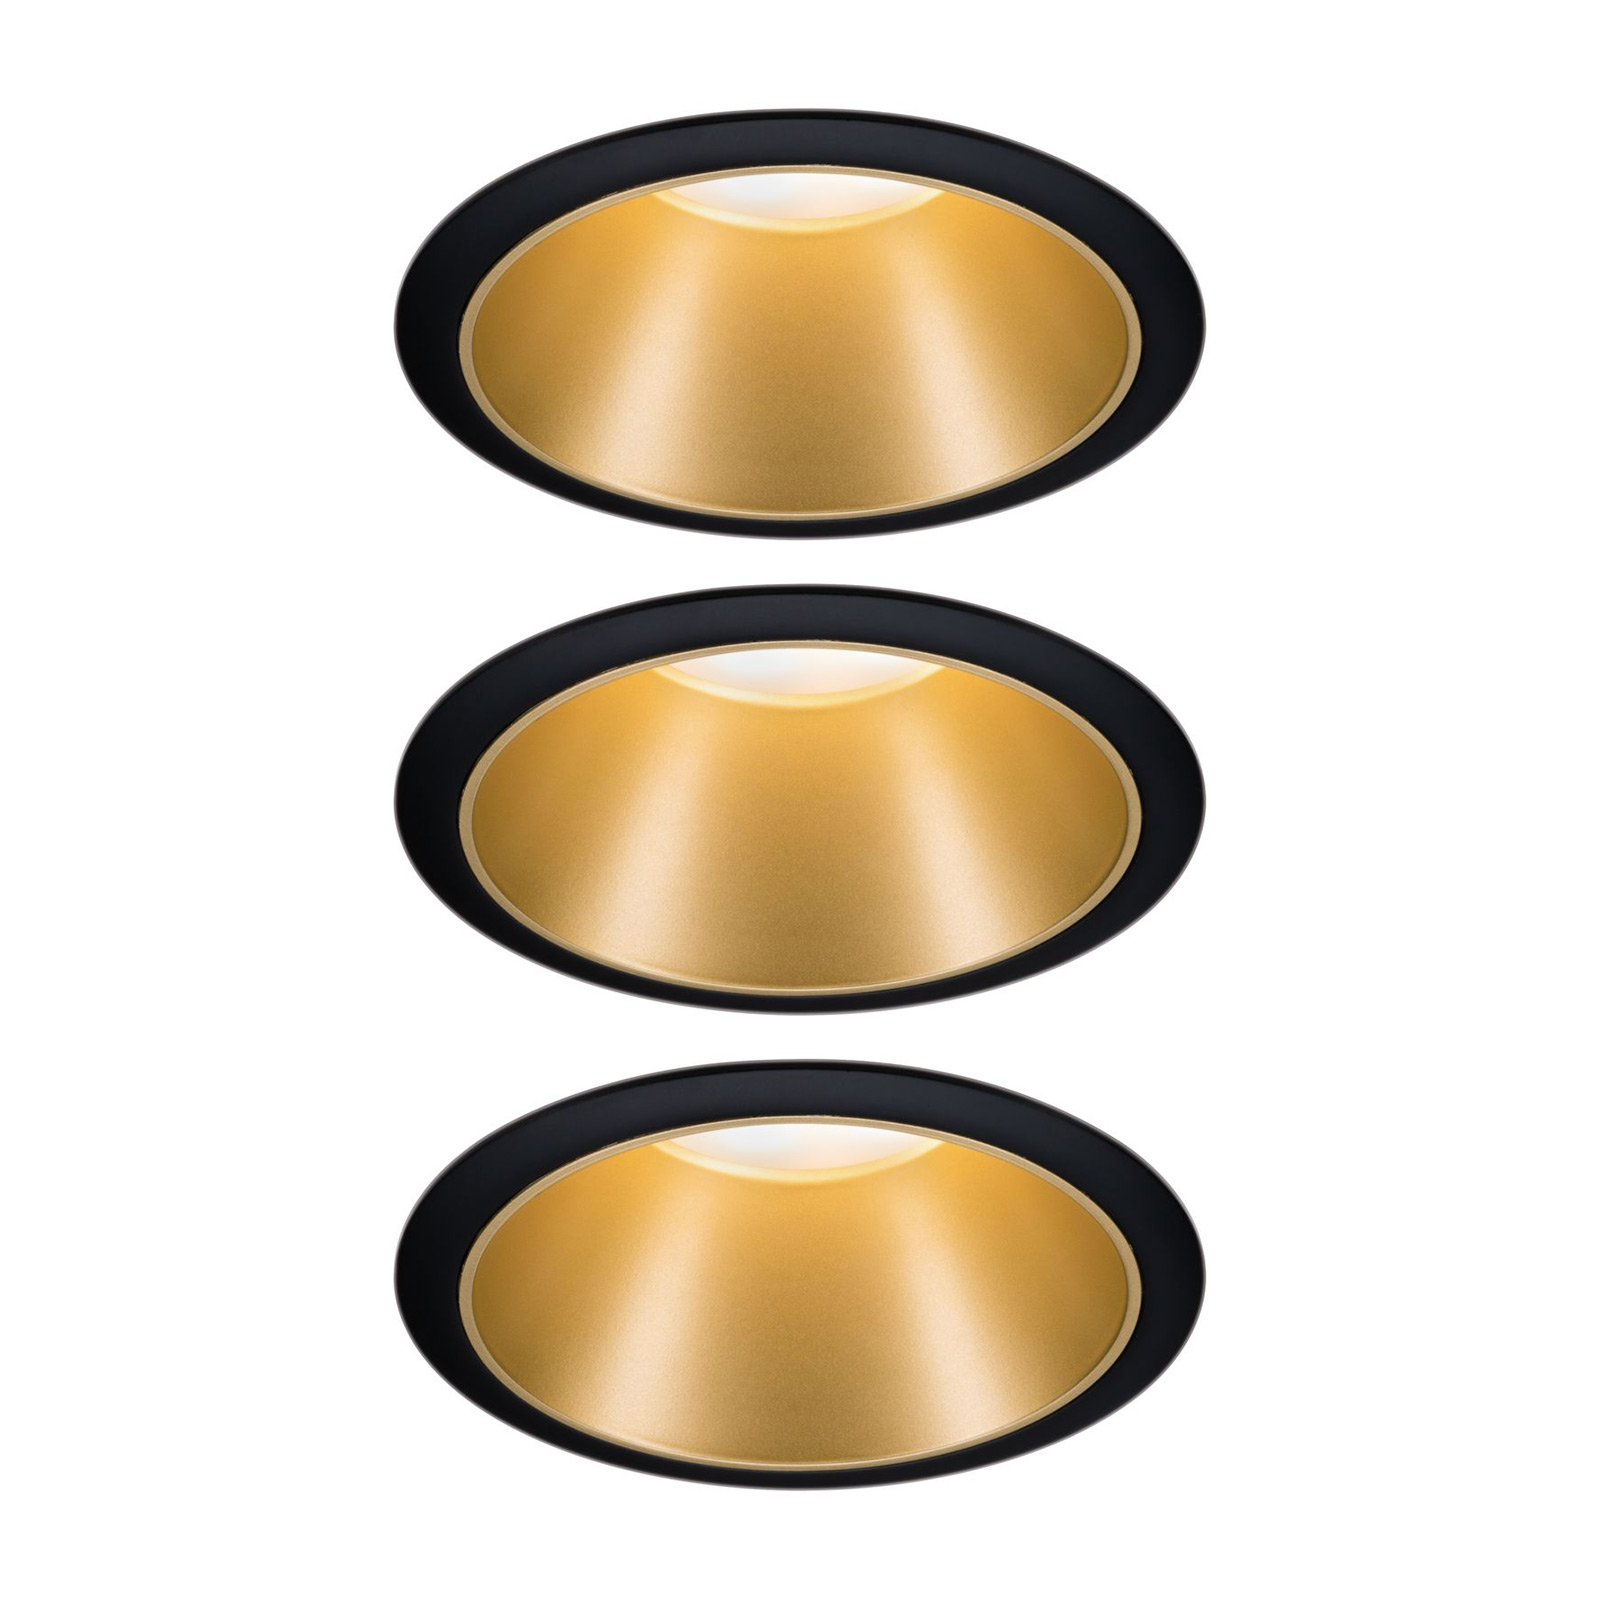 Paulmann Cole LED spotlight, gold finish set of 3_7601681_1